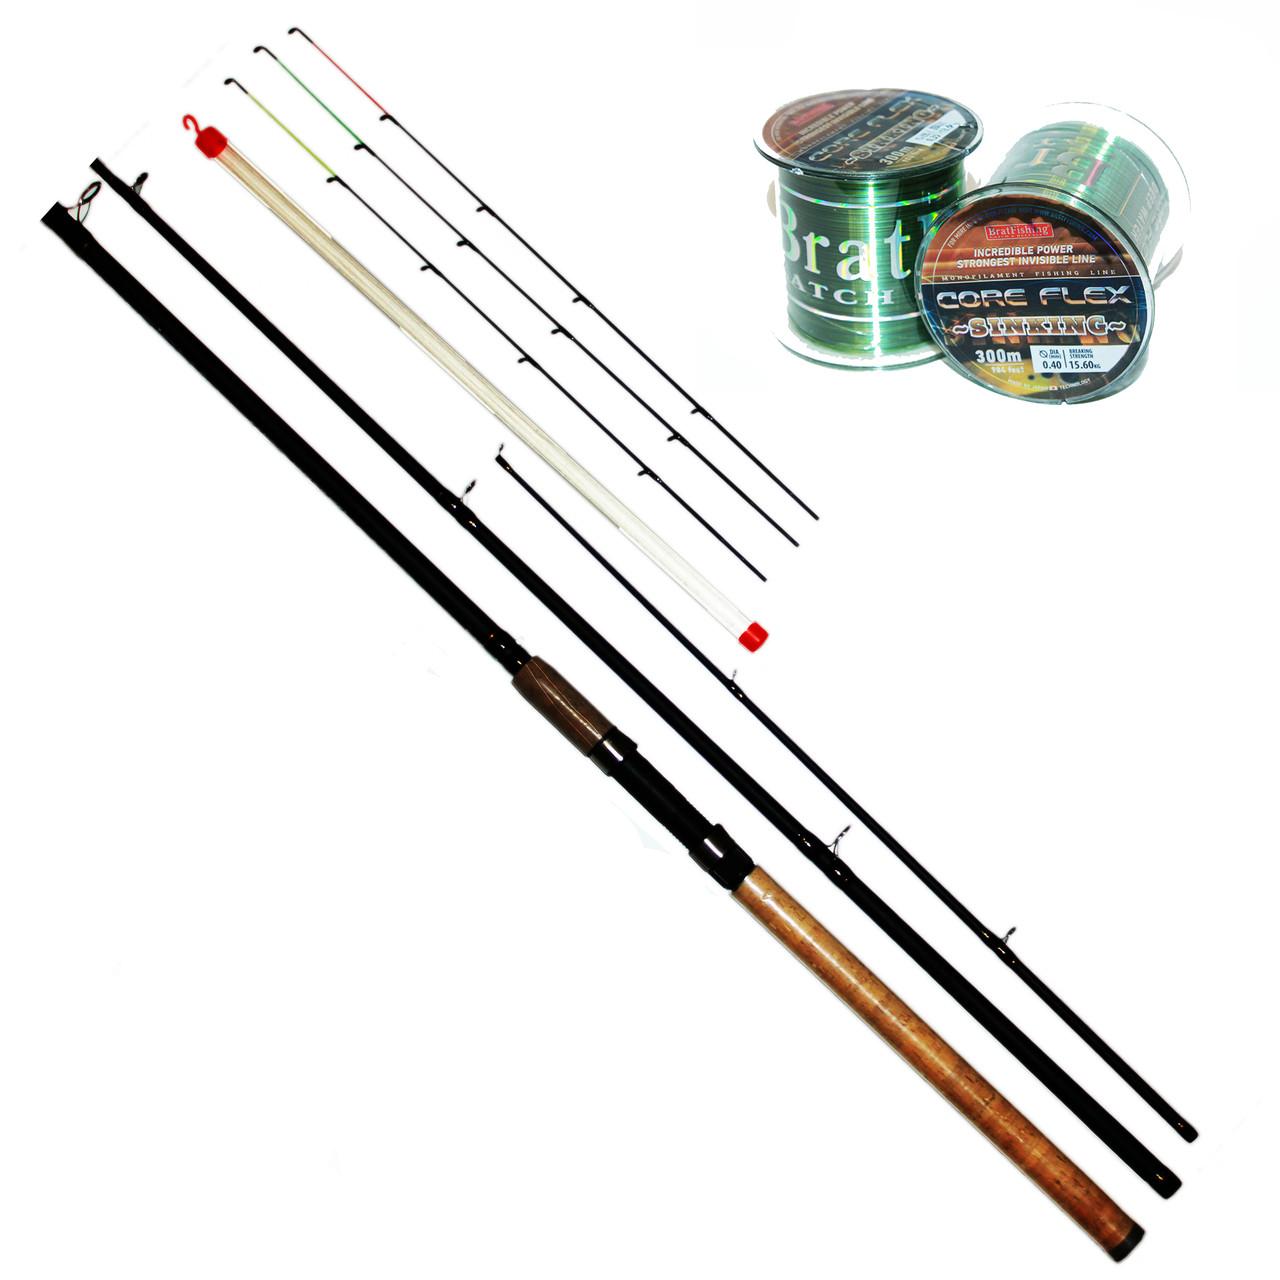 Фідерне вудилище Bratfishing TAIPAN FEEDER +3 tips / 3.30 M / g 80-180